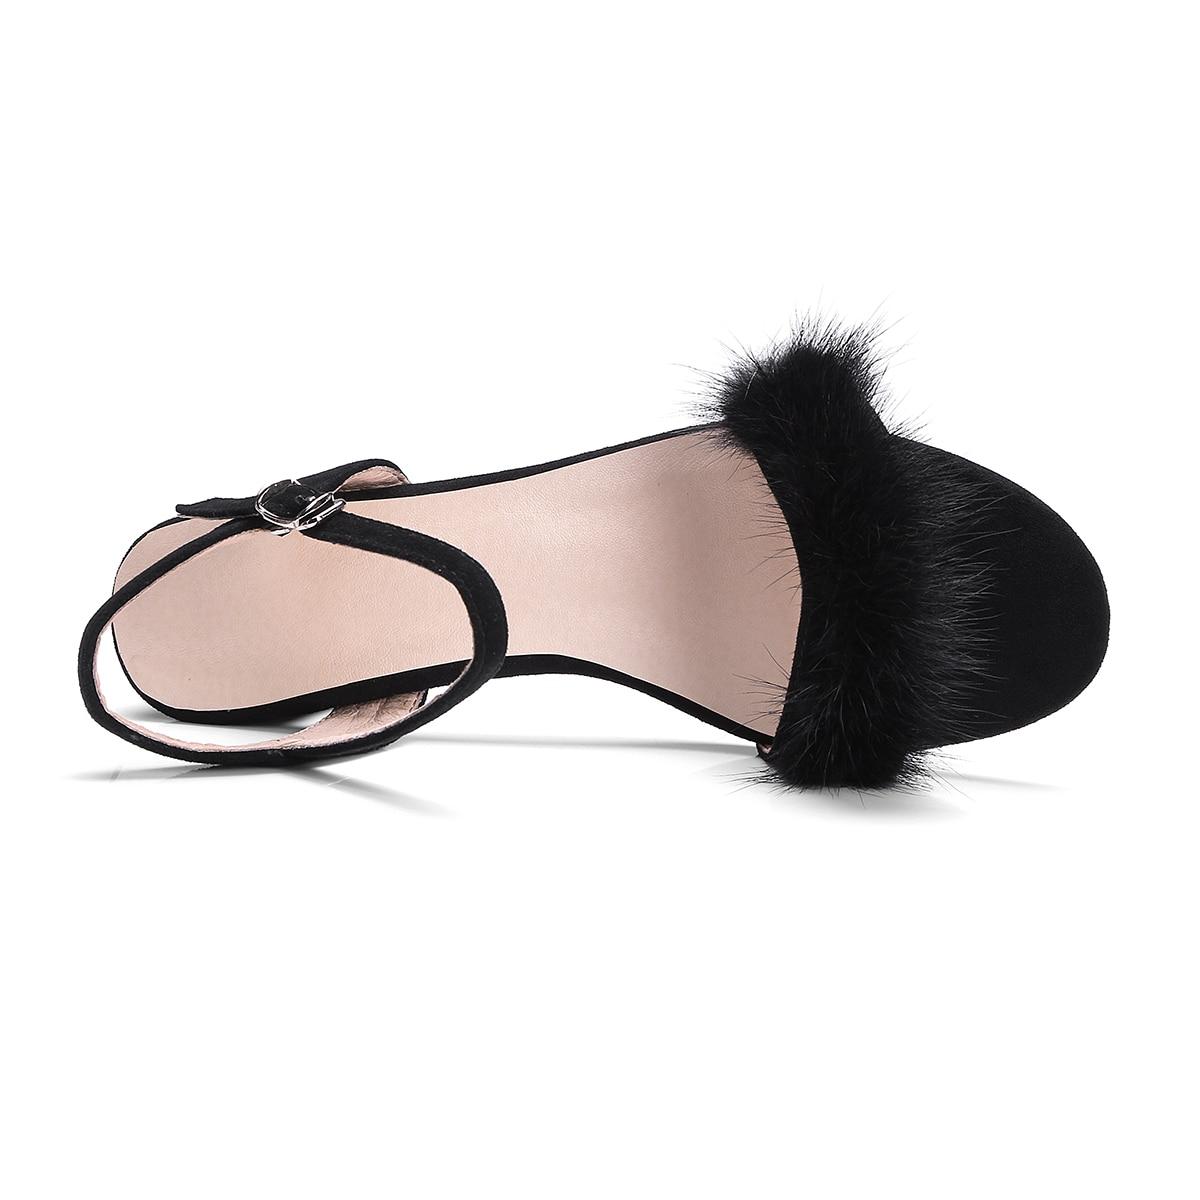 TASSLYNN 2019 Summer Open Toe Women 39 s Sandals Low Square Heel Faux Fur Women Shoes Sweet Style Shoes Ankle Strap Size 34 42 in High Heels from Shoes